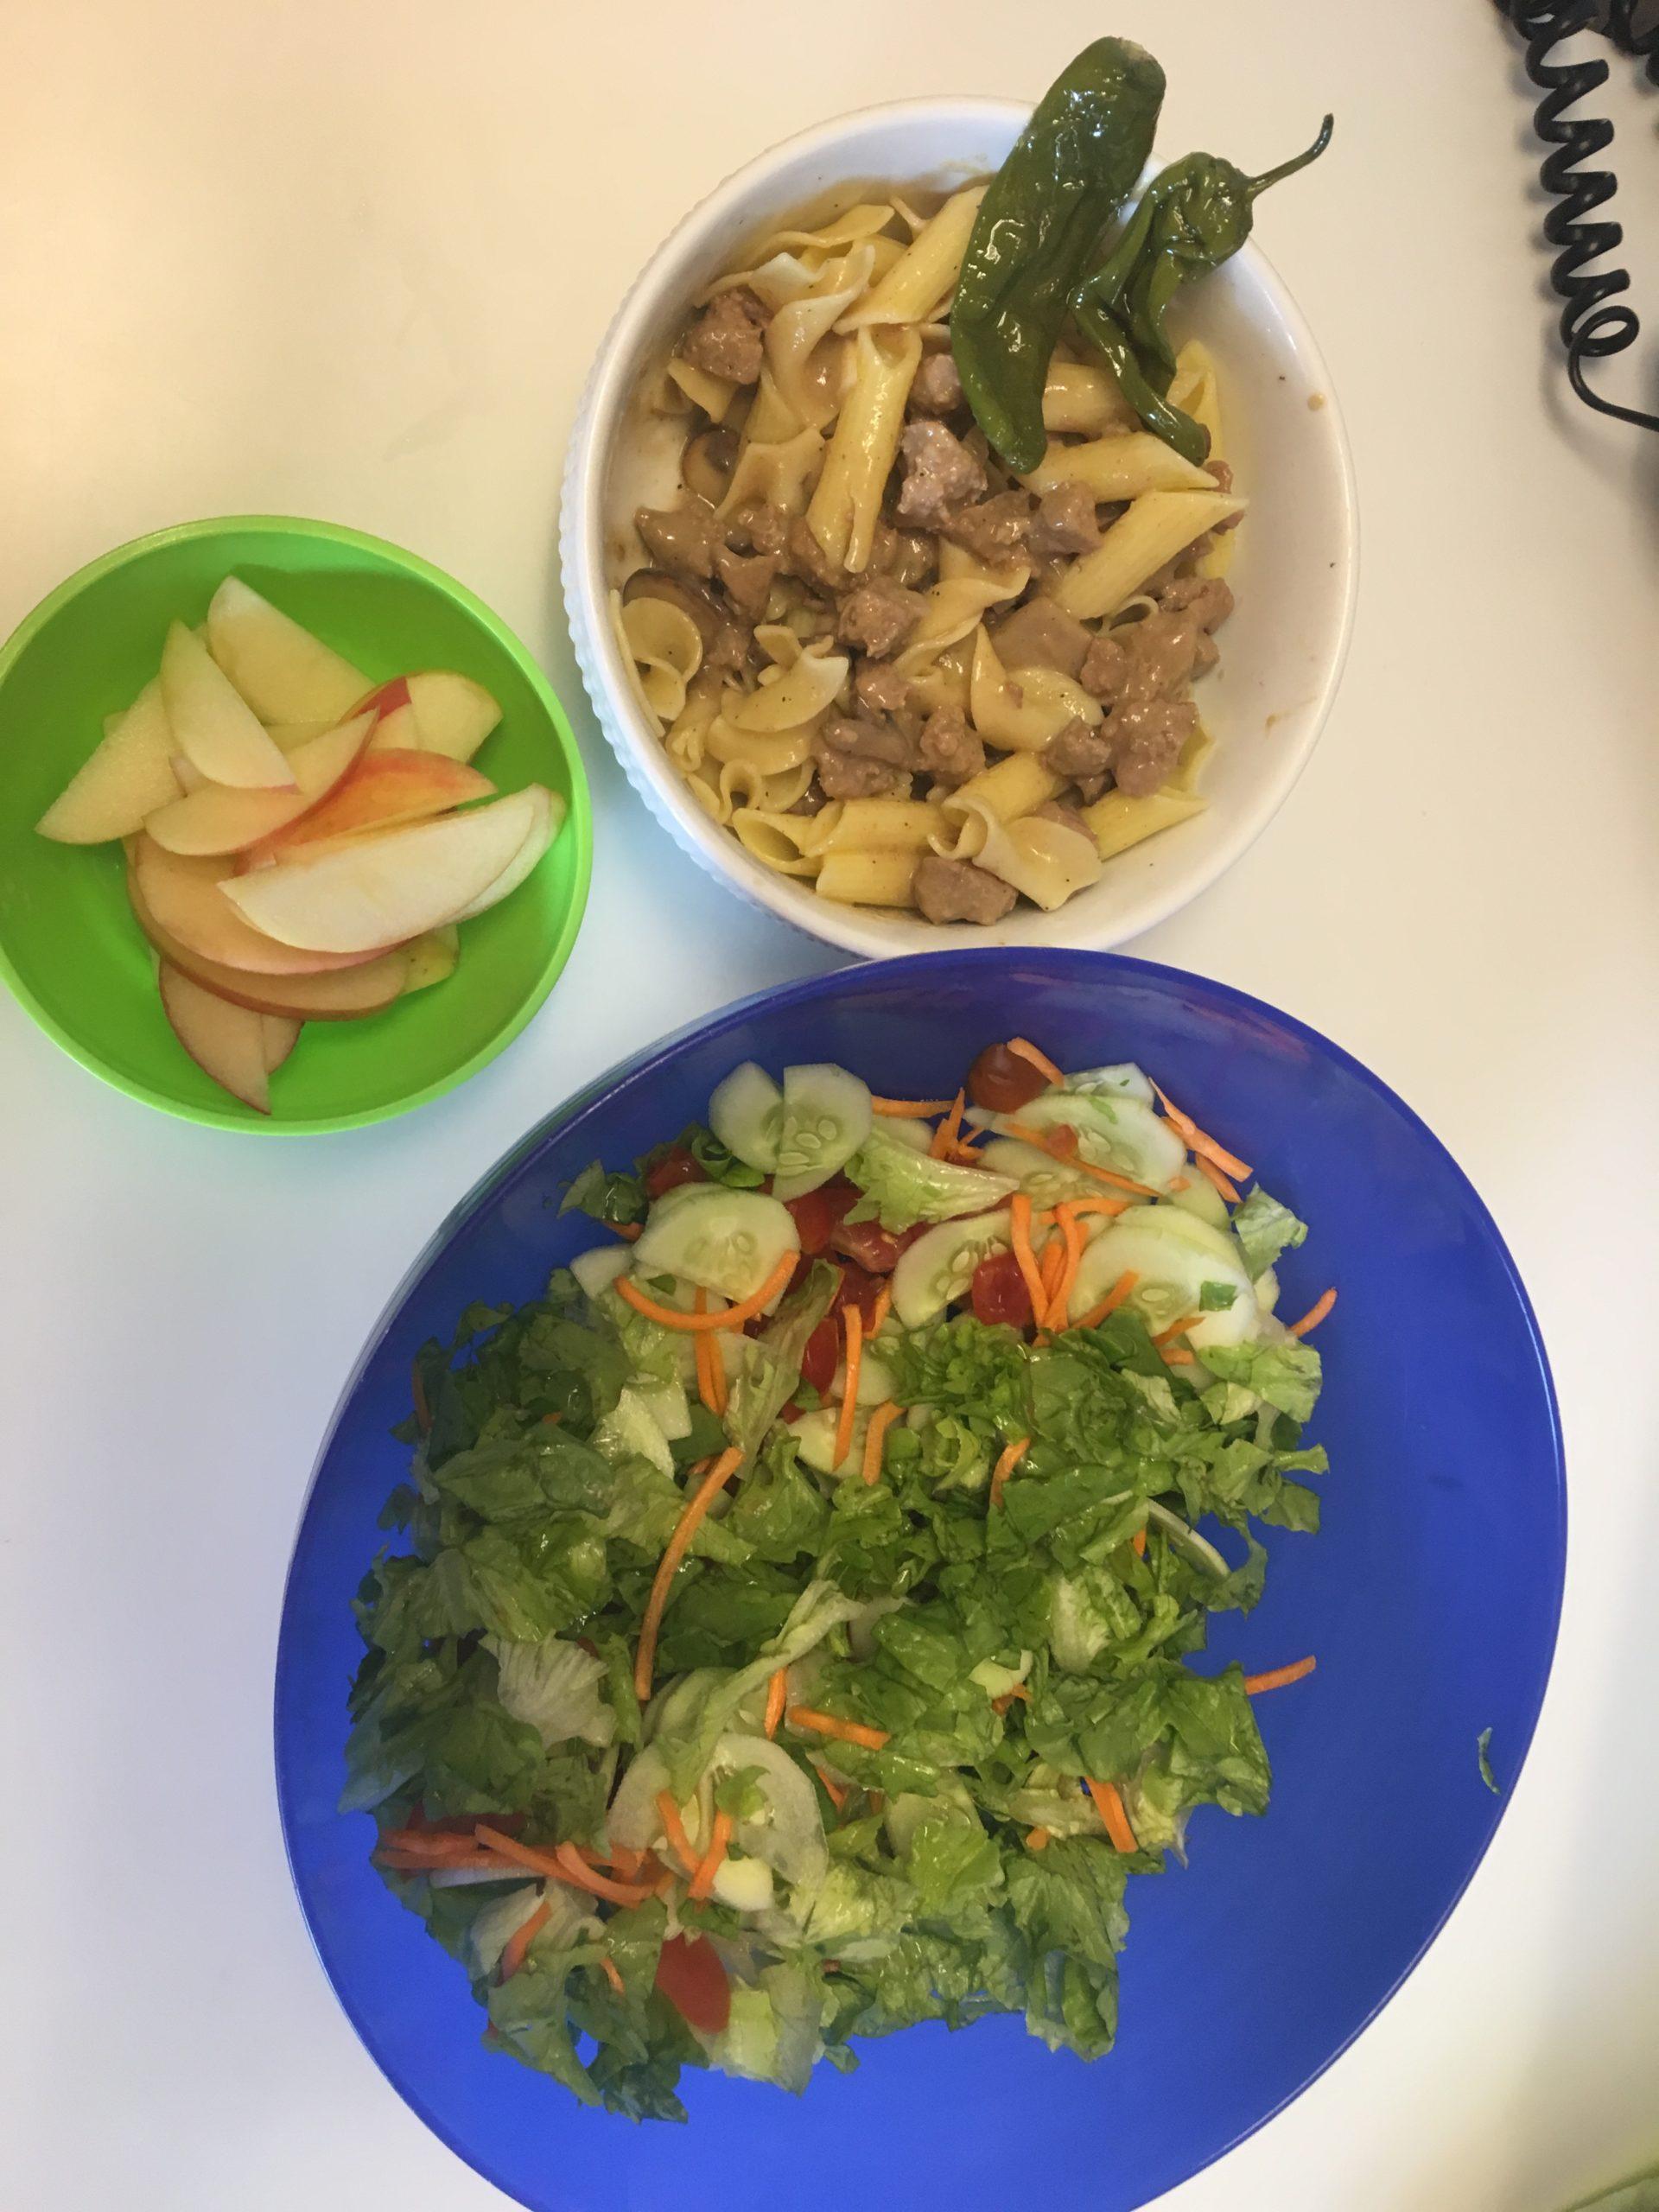 Beef Stroganoff, salad, and apples